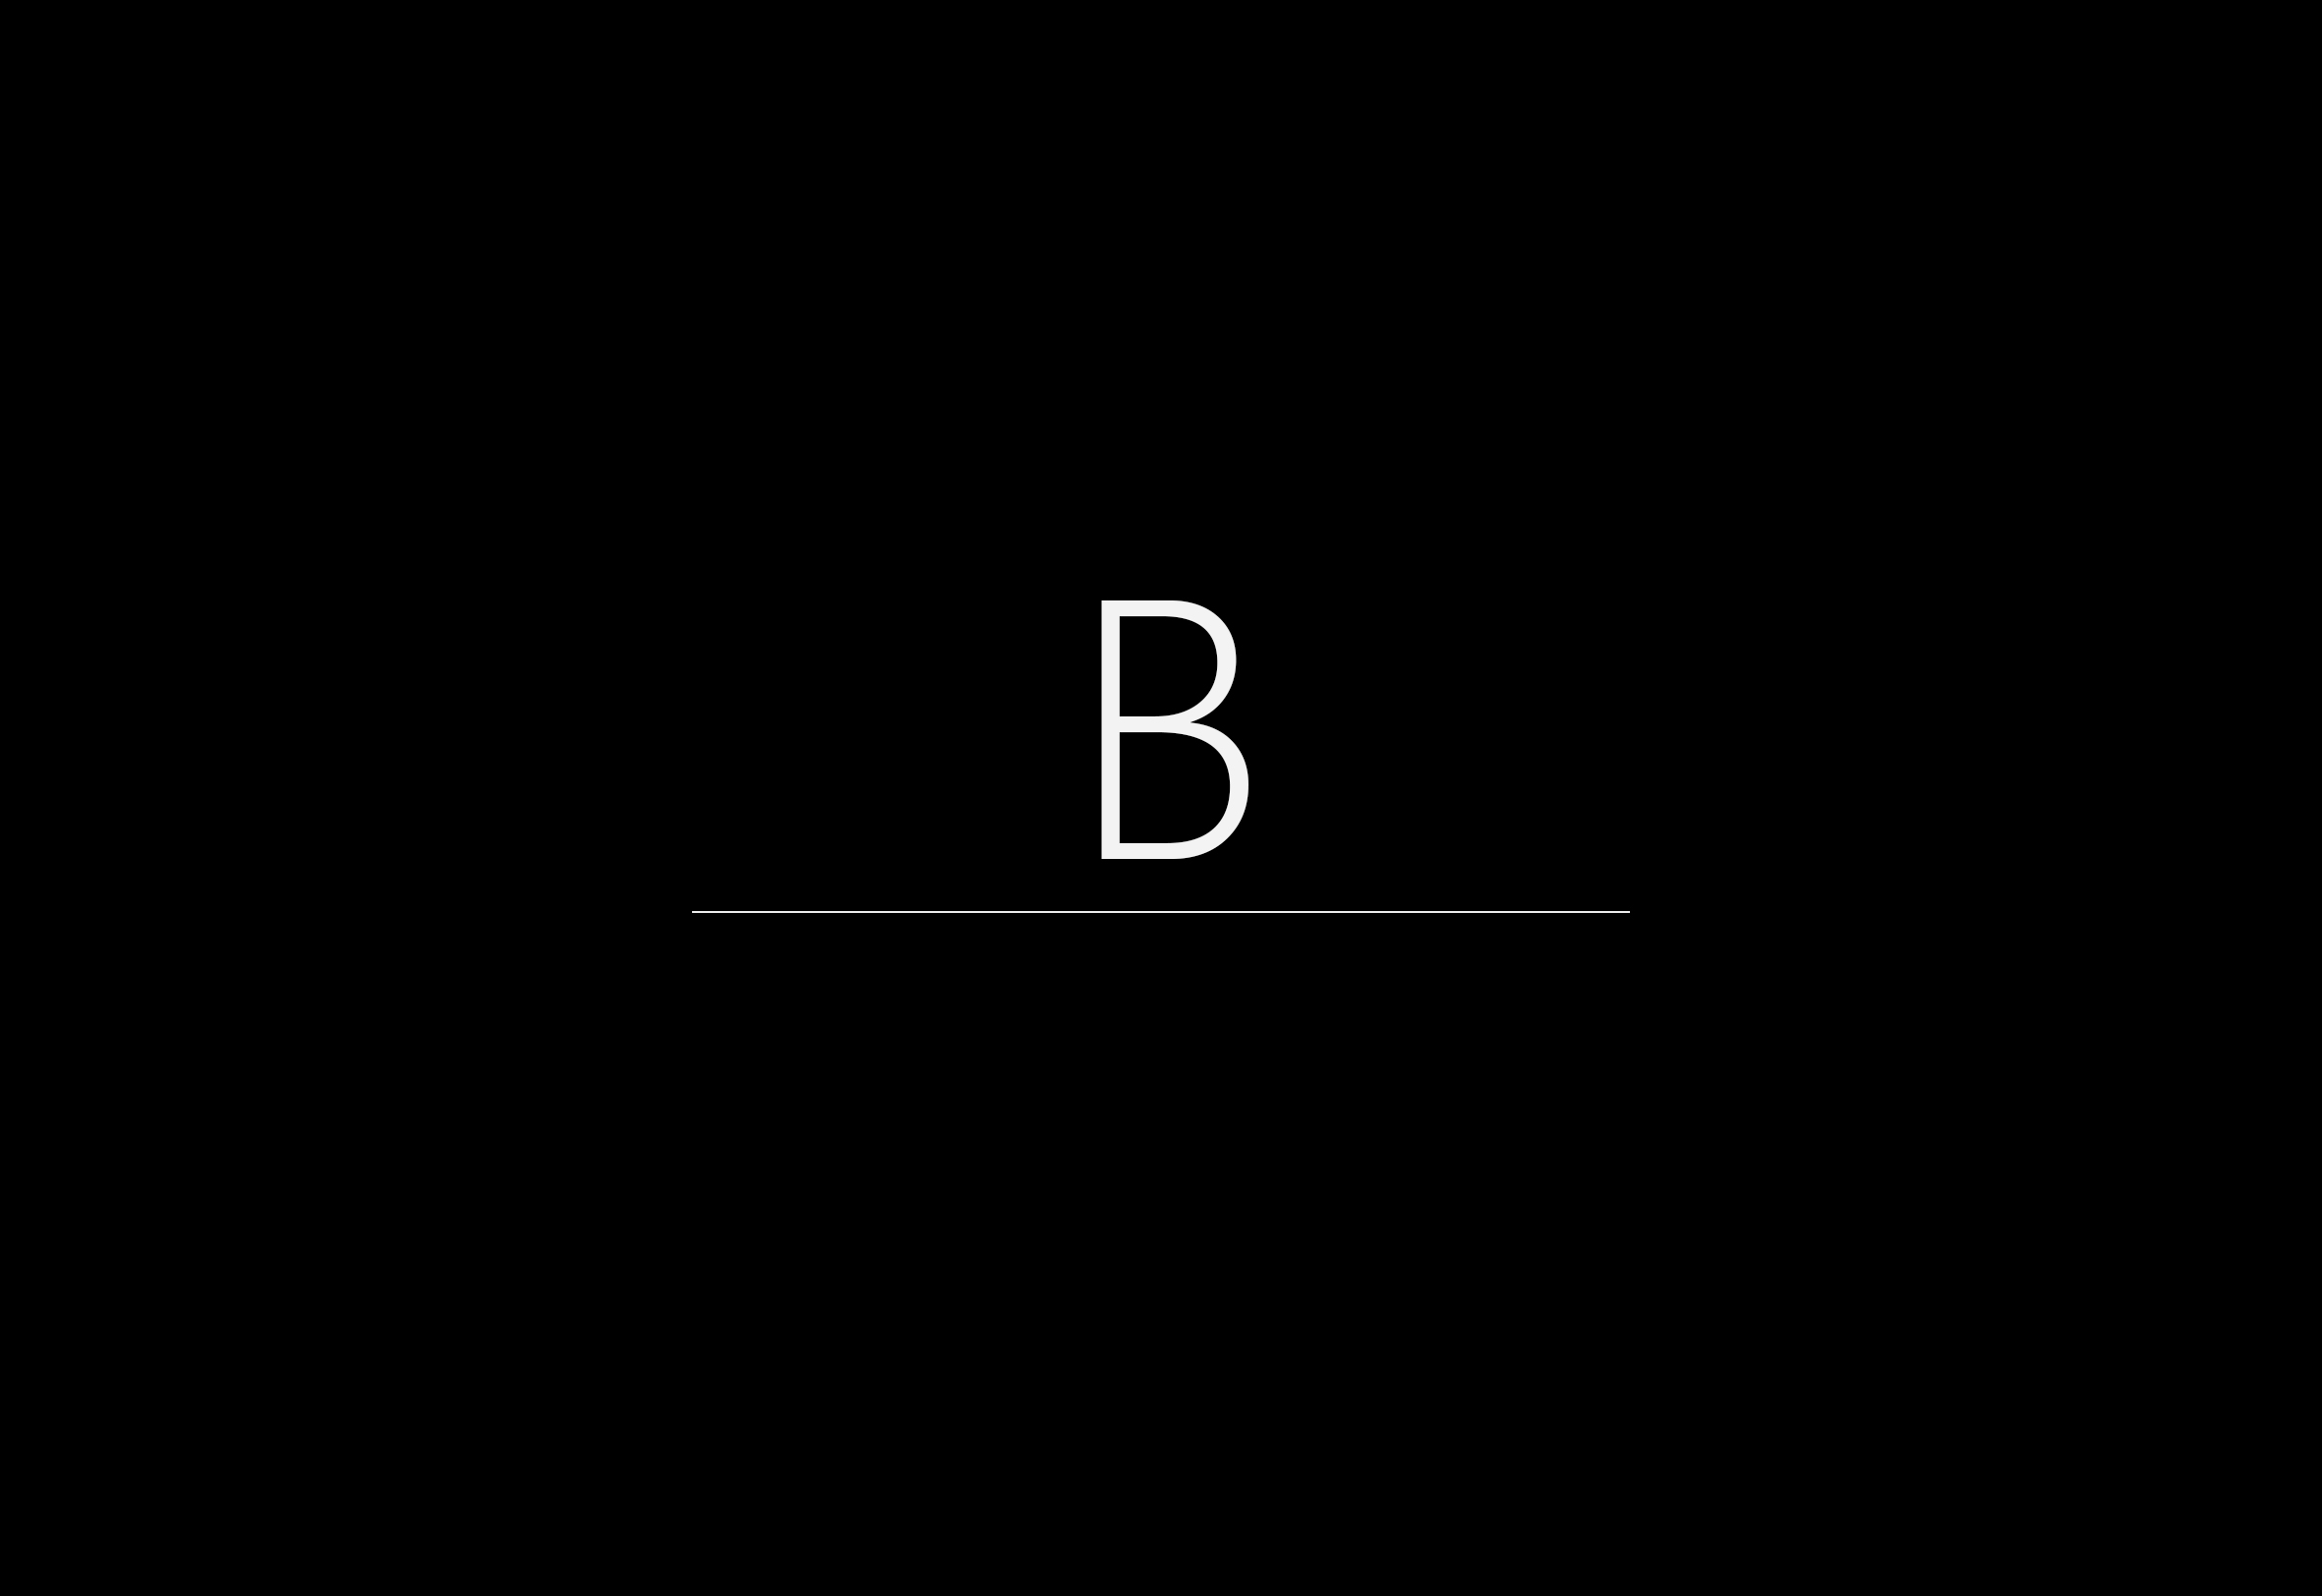 Presentation_B.jpg